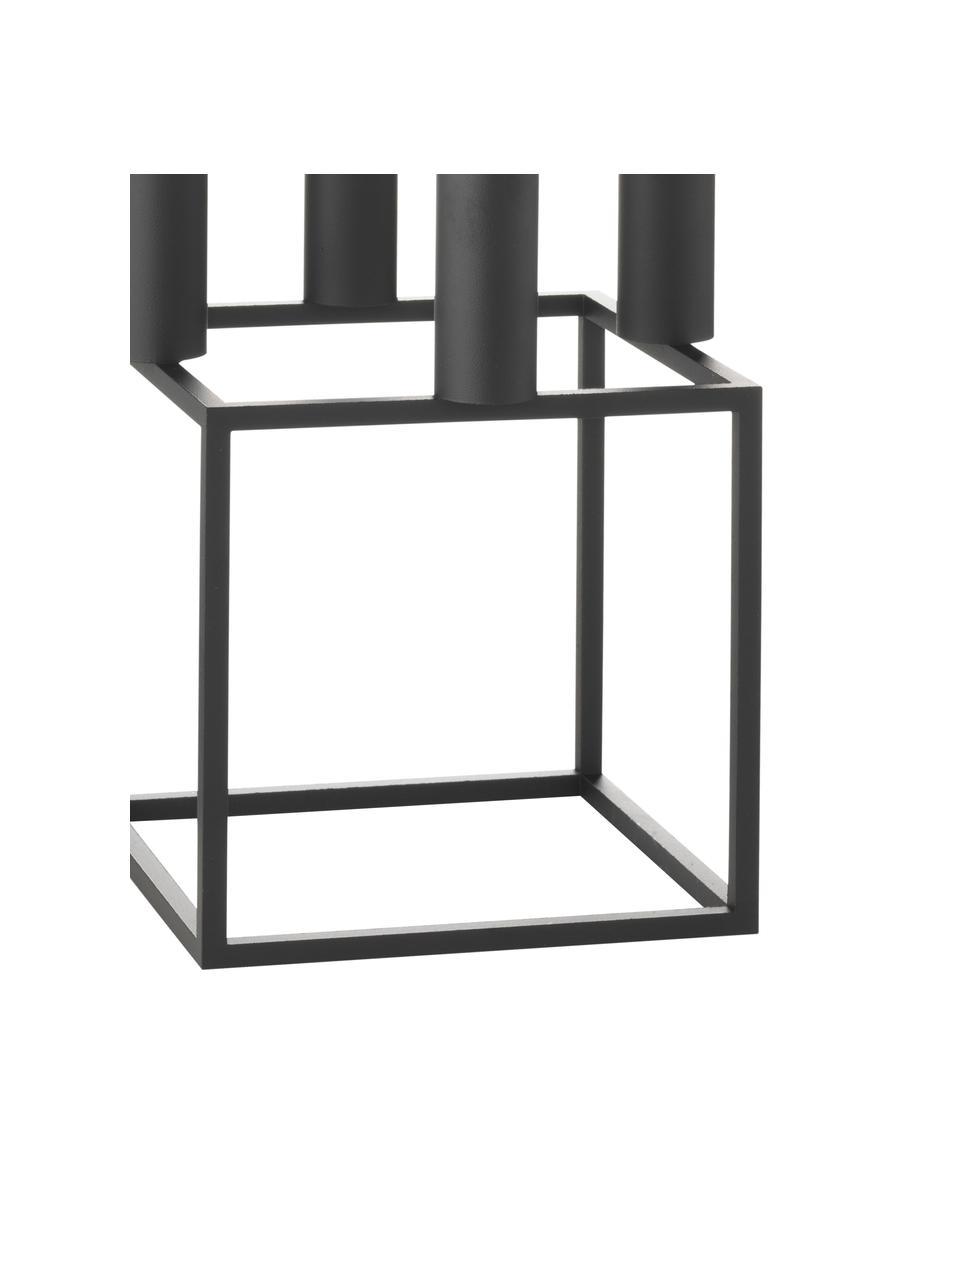 Kandelaar Kubus, Gelakt staal, Zwart, 14 x 20 cm